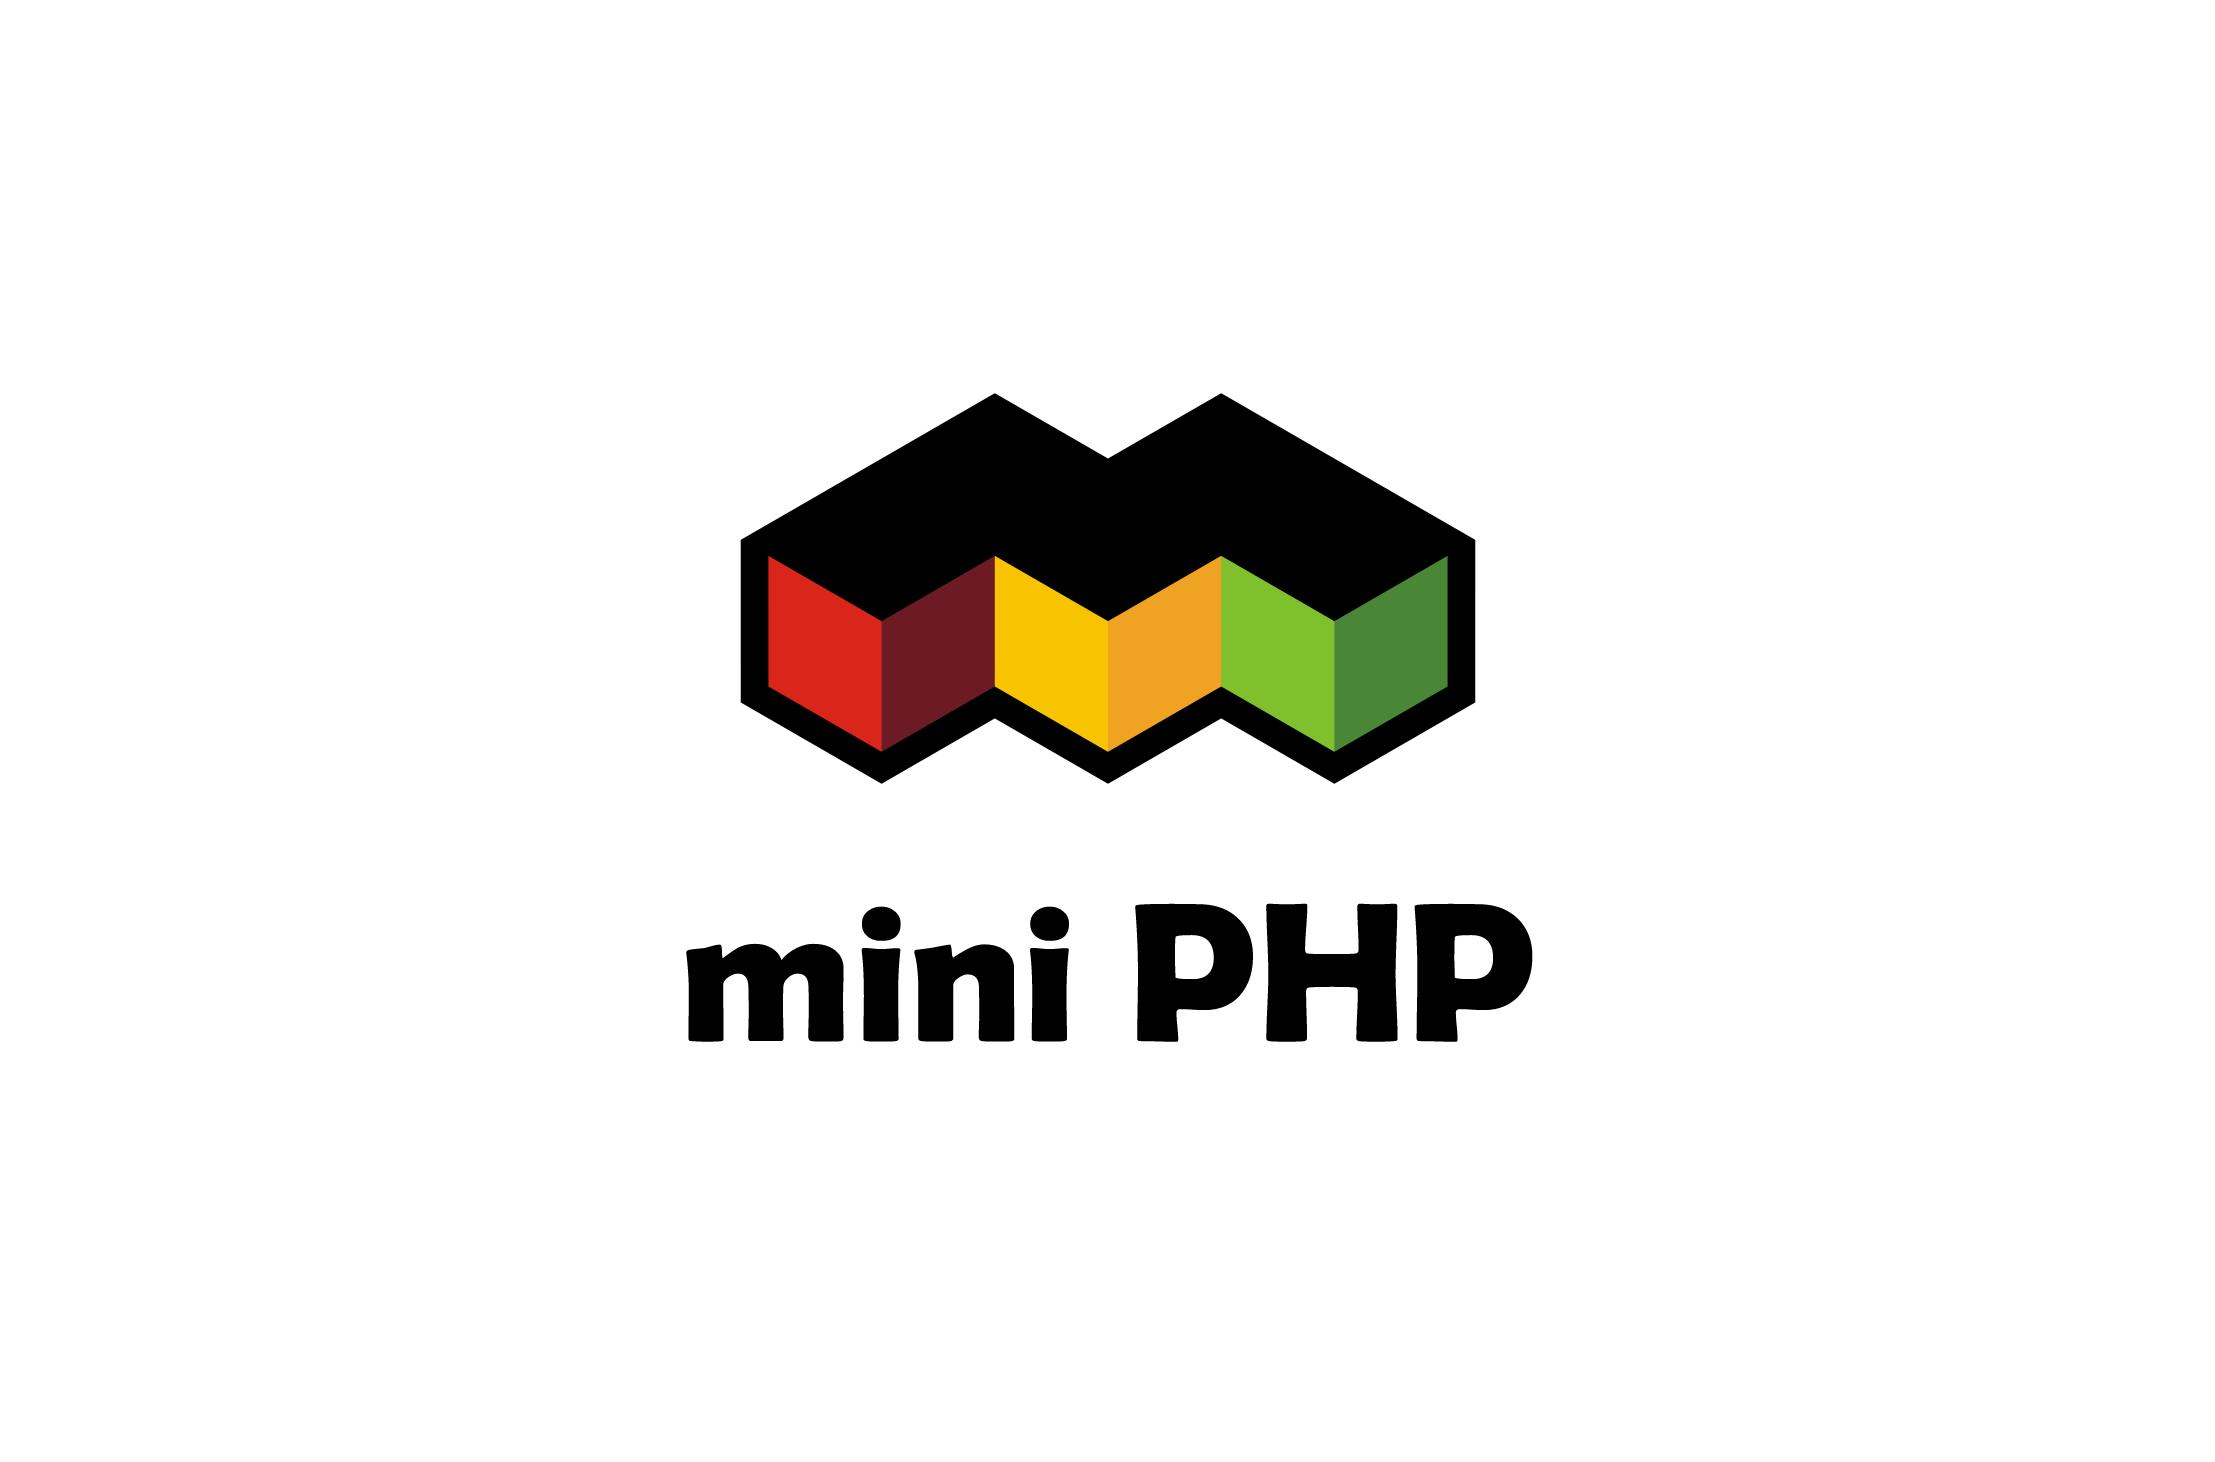 GitHub - OmarElGabry/miniPHP: A small, simple PHP MVC framework ...